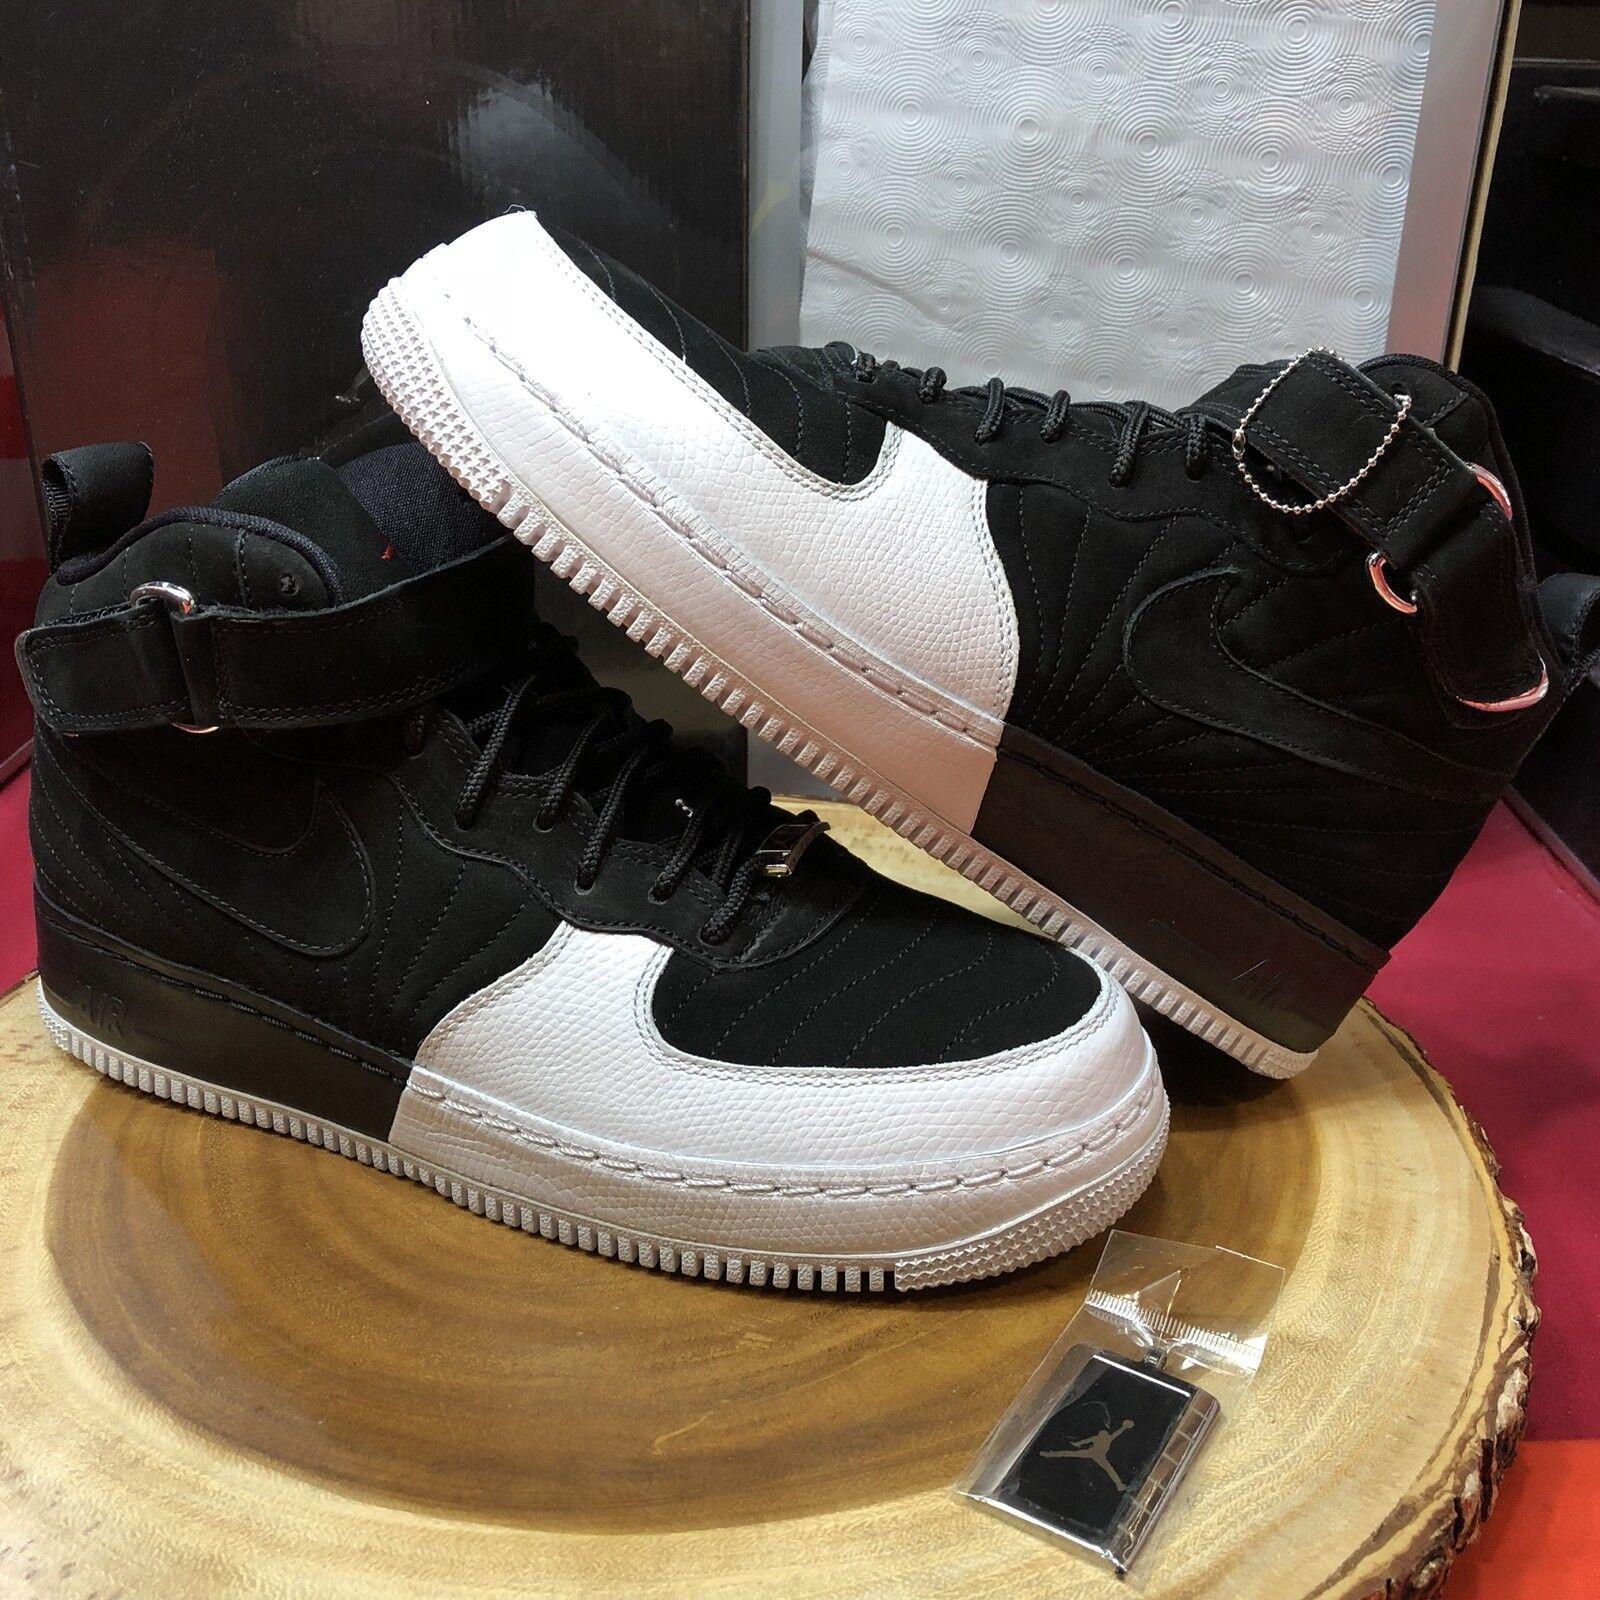 Nike Air Jordan Force Fusion AJF 12 XII One Playoff I Taxi Black Sz 10 I Playoff Bred Oreo dbb614